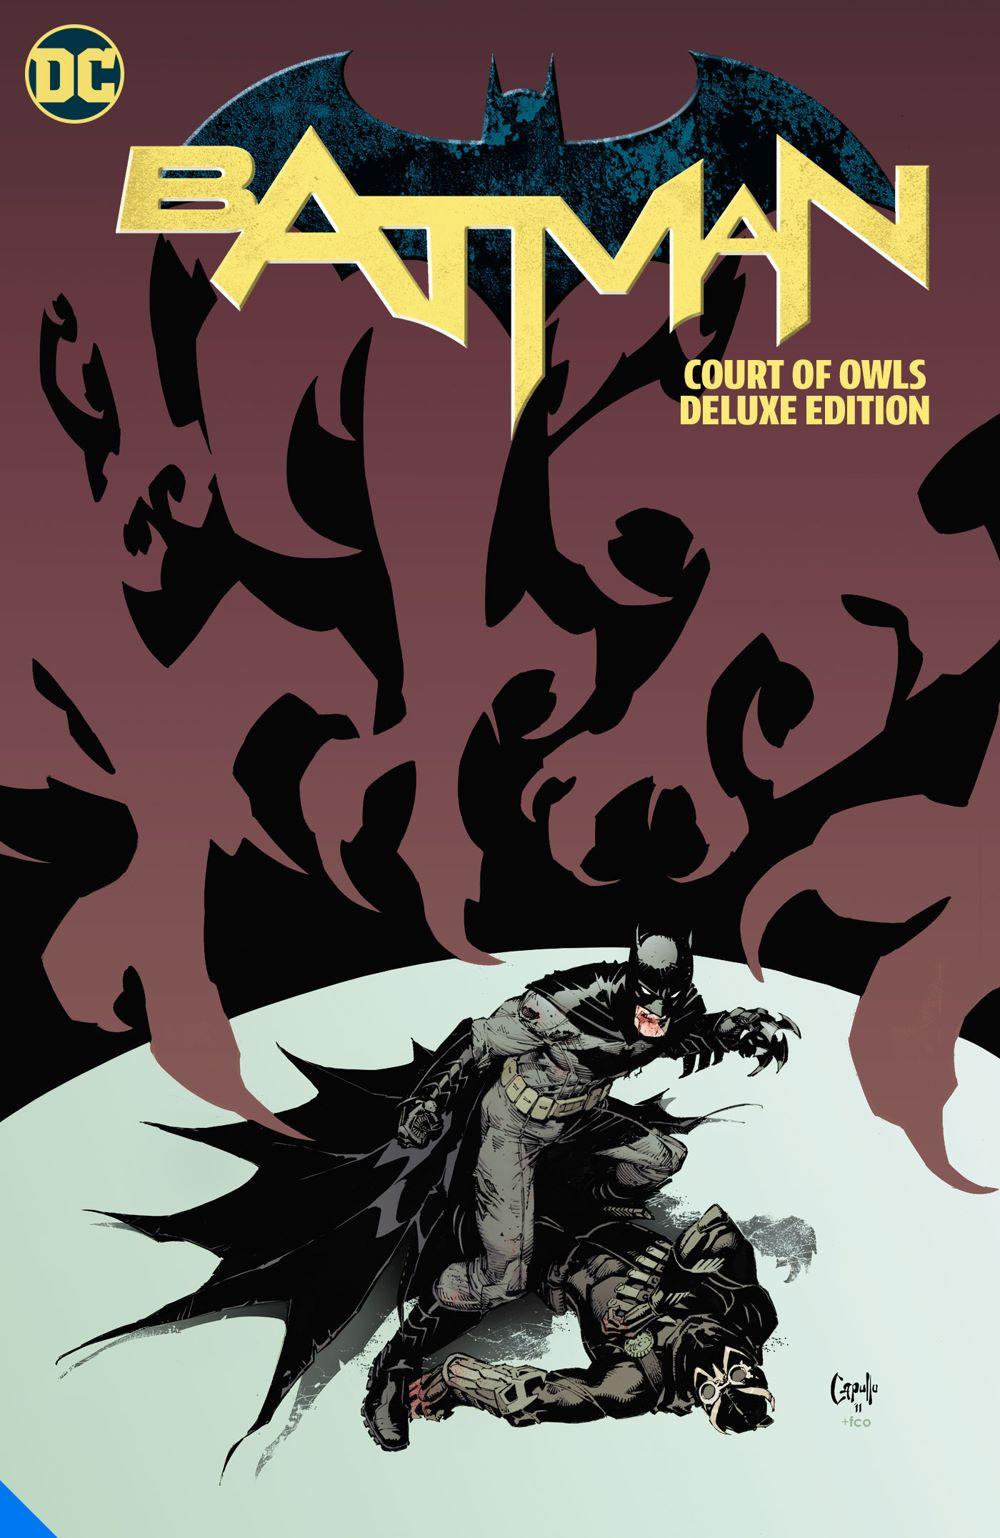 batmancourtofowls-dlx_adv DC Comics July 2021 Solicitations